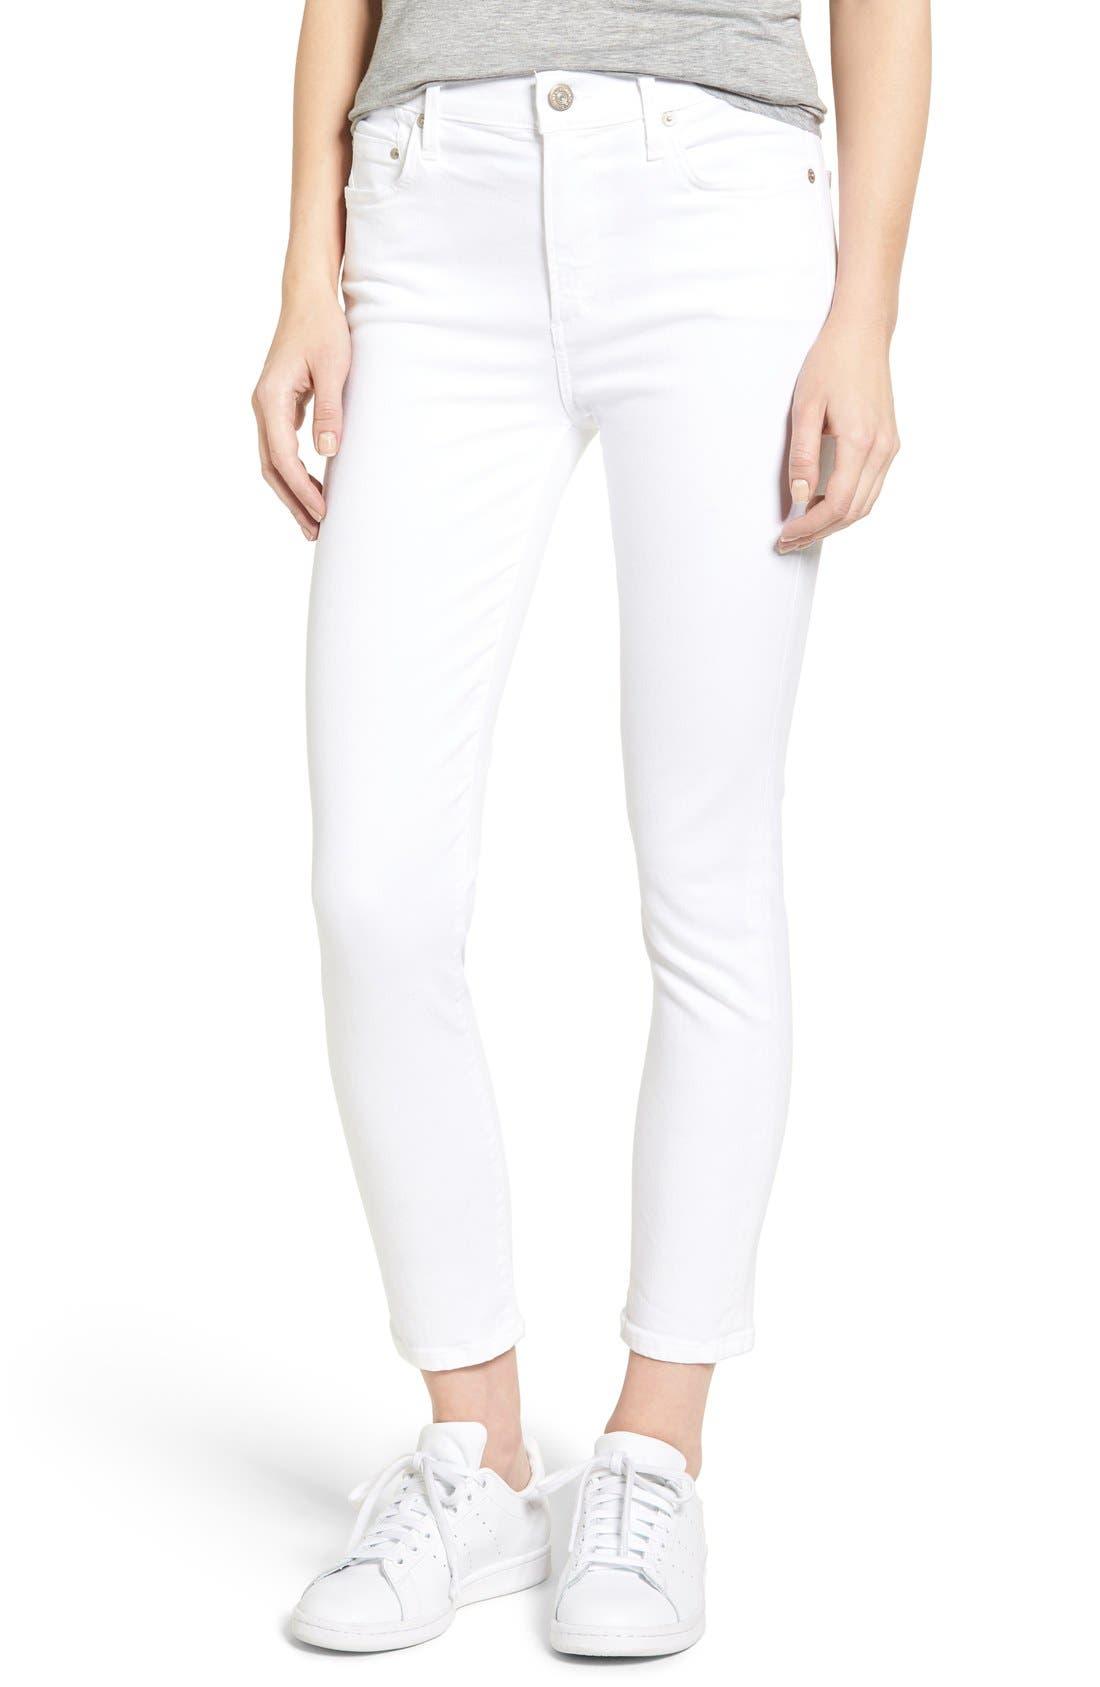 Rocket High Waist Crop Skinny Jeans,                             Main thumbnail 1, color,                             SCULPT WHITE